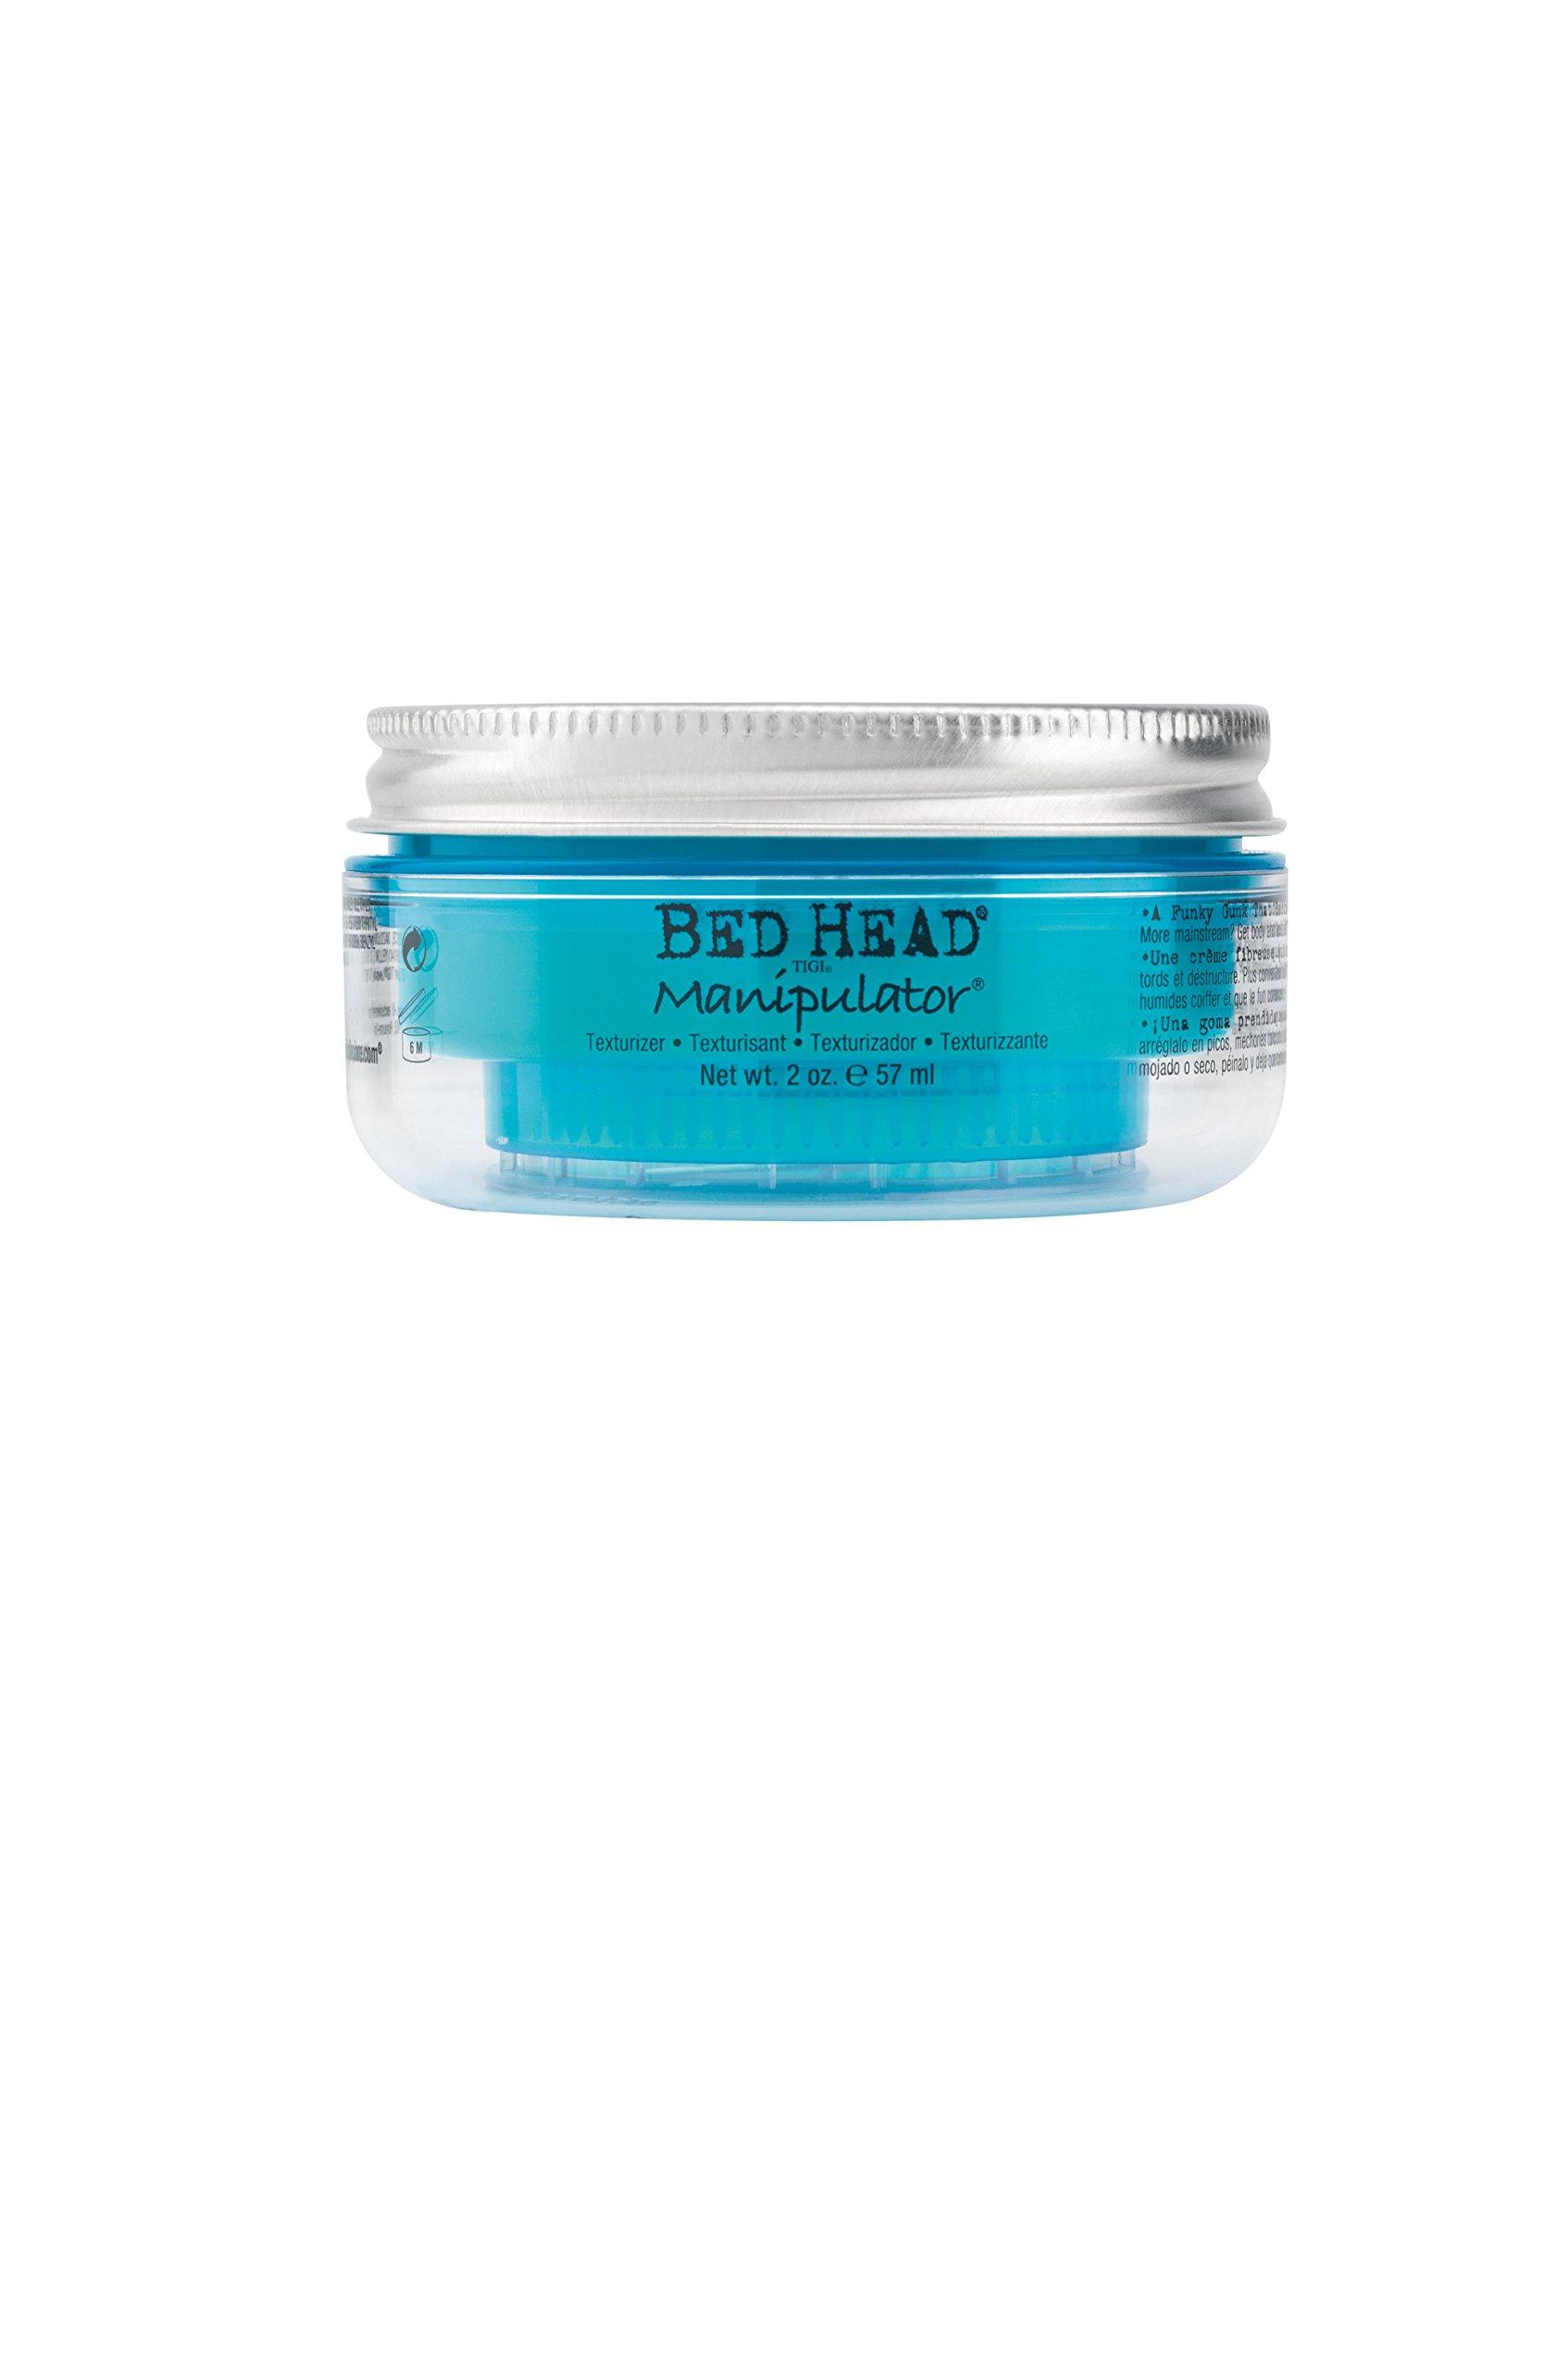 TIGI Bed Head Manipulator pack 2 by TIGI Cosmetics